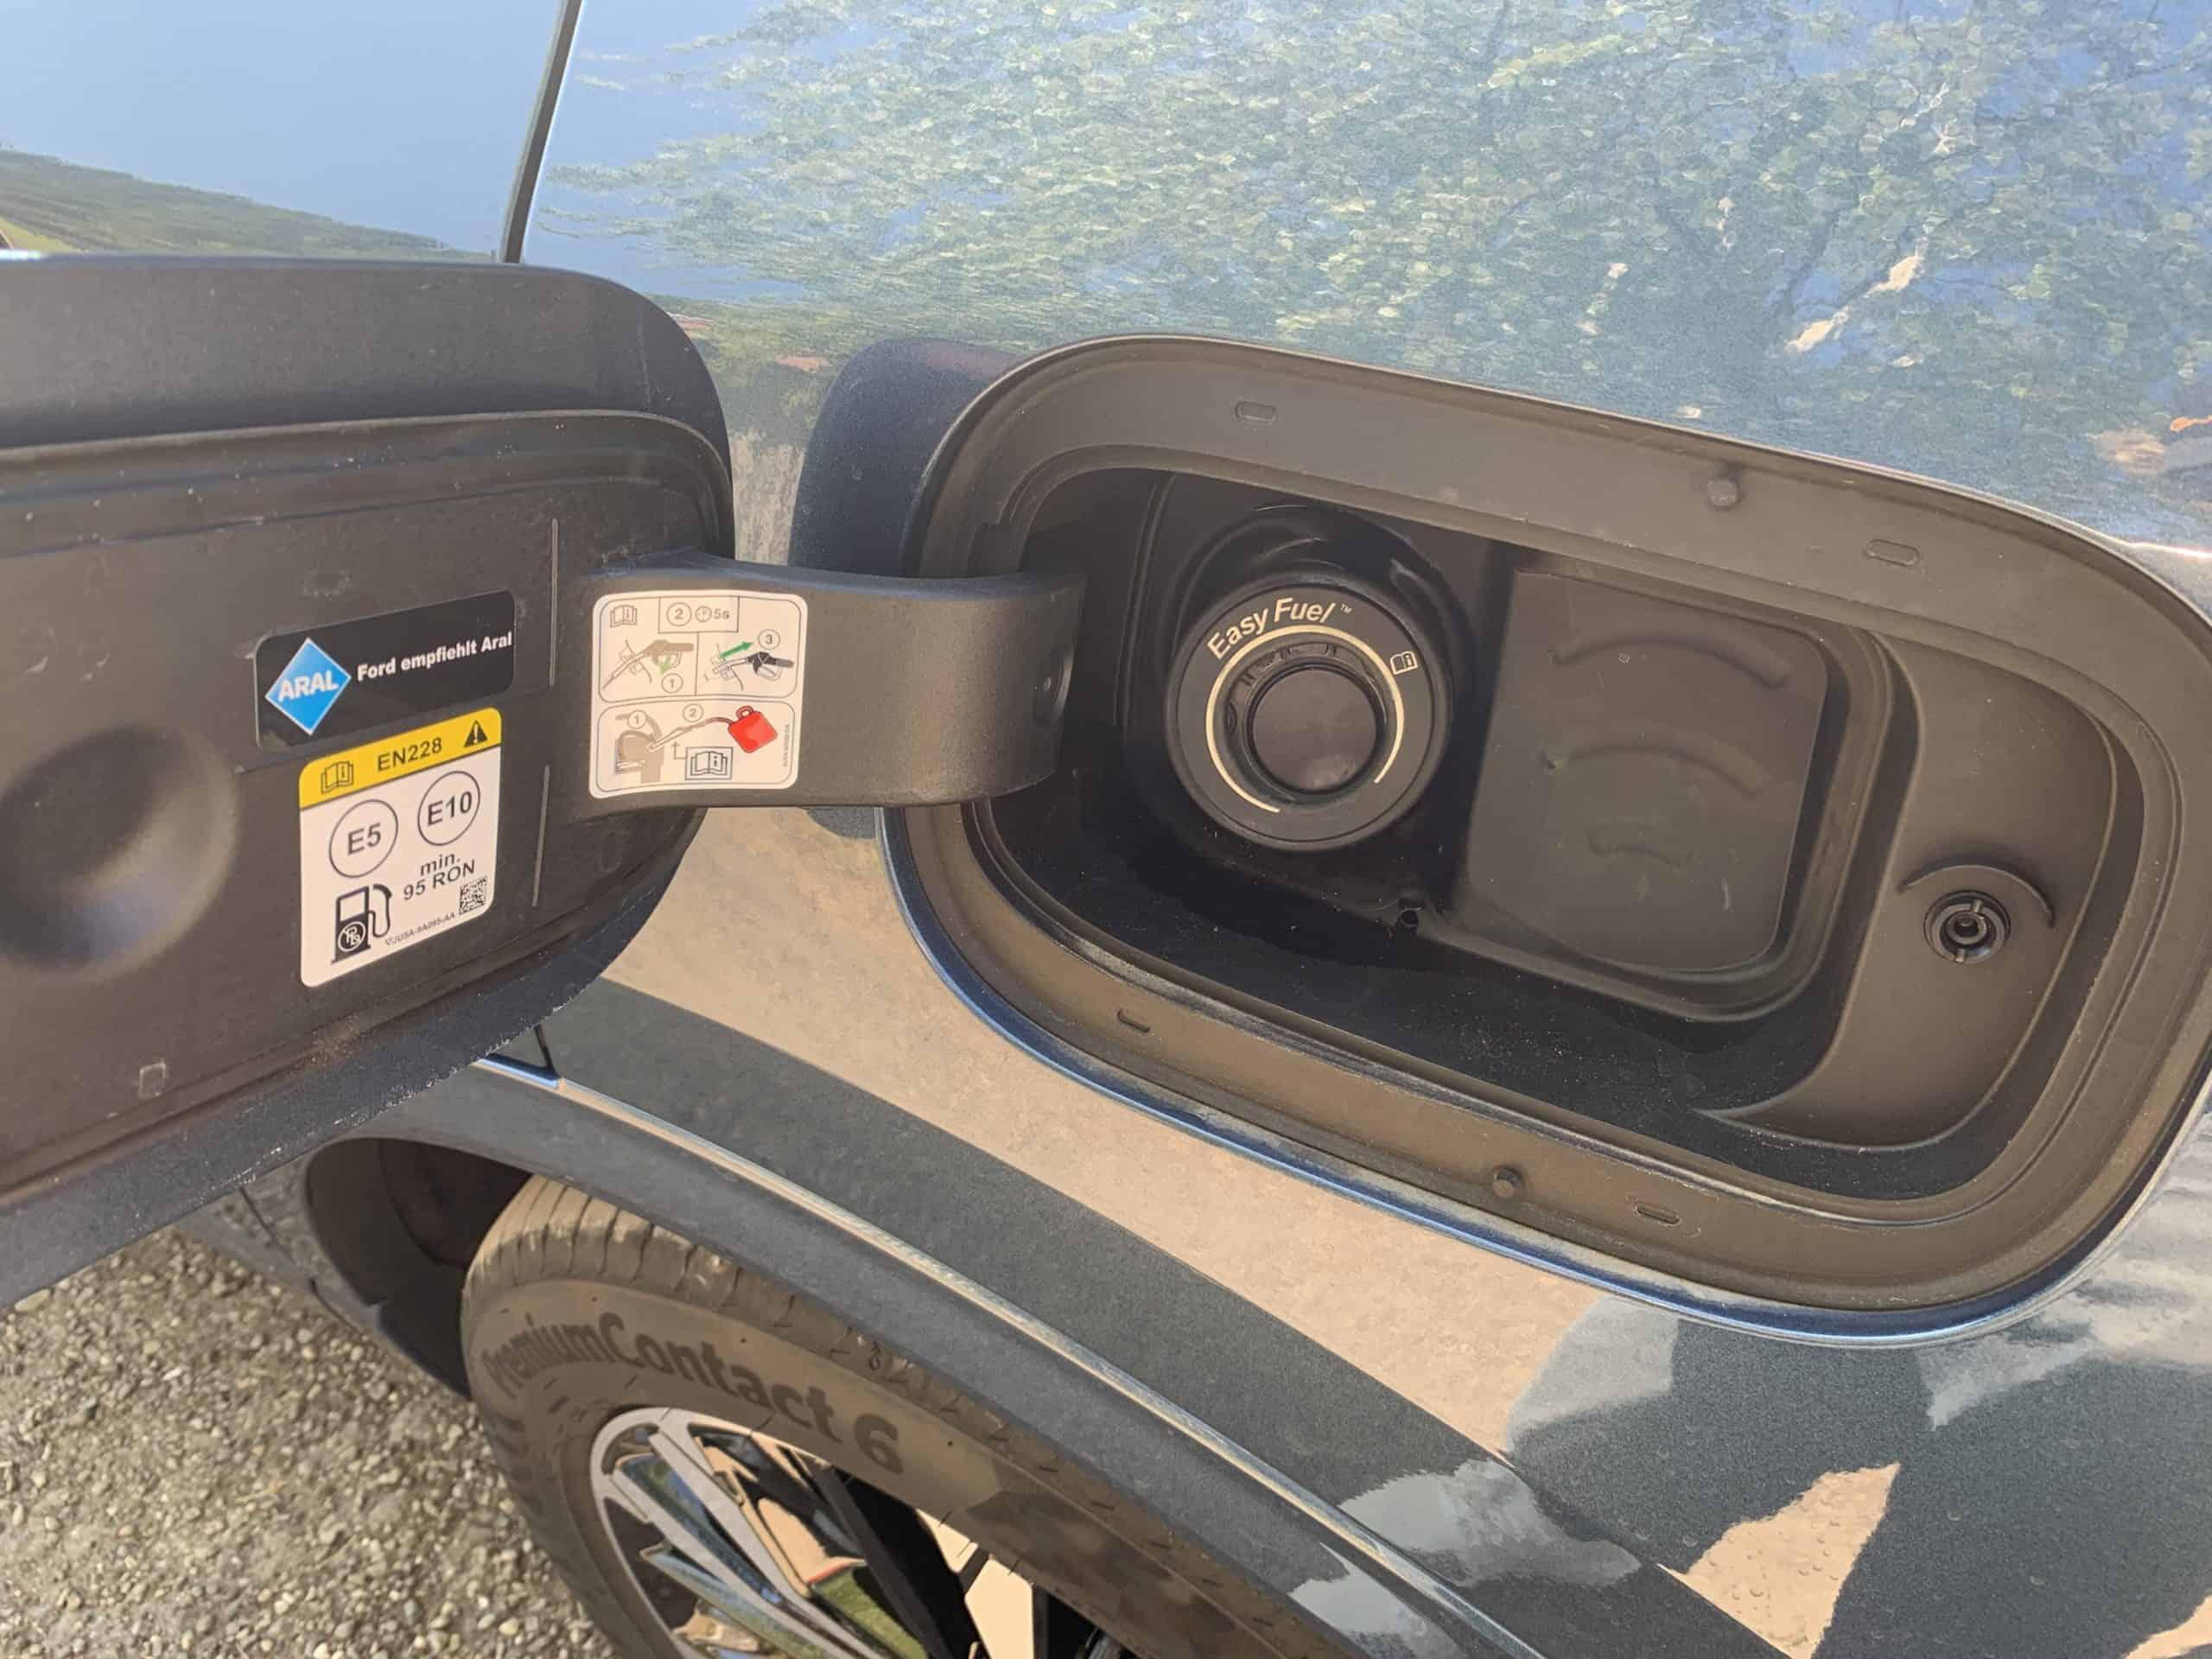 Ford Kuga Plug-in-Hybrid ST-Line X, 2,5 l Duratec